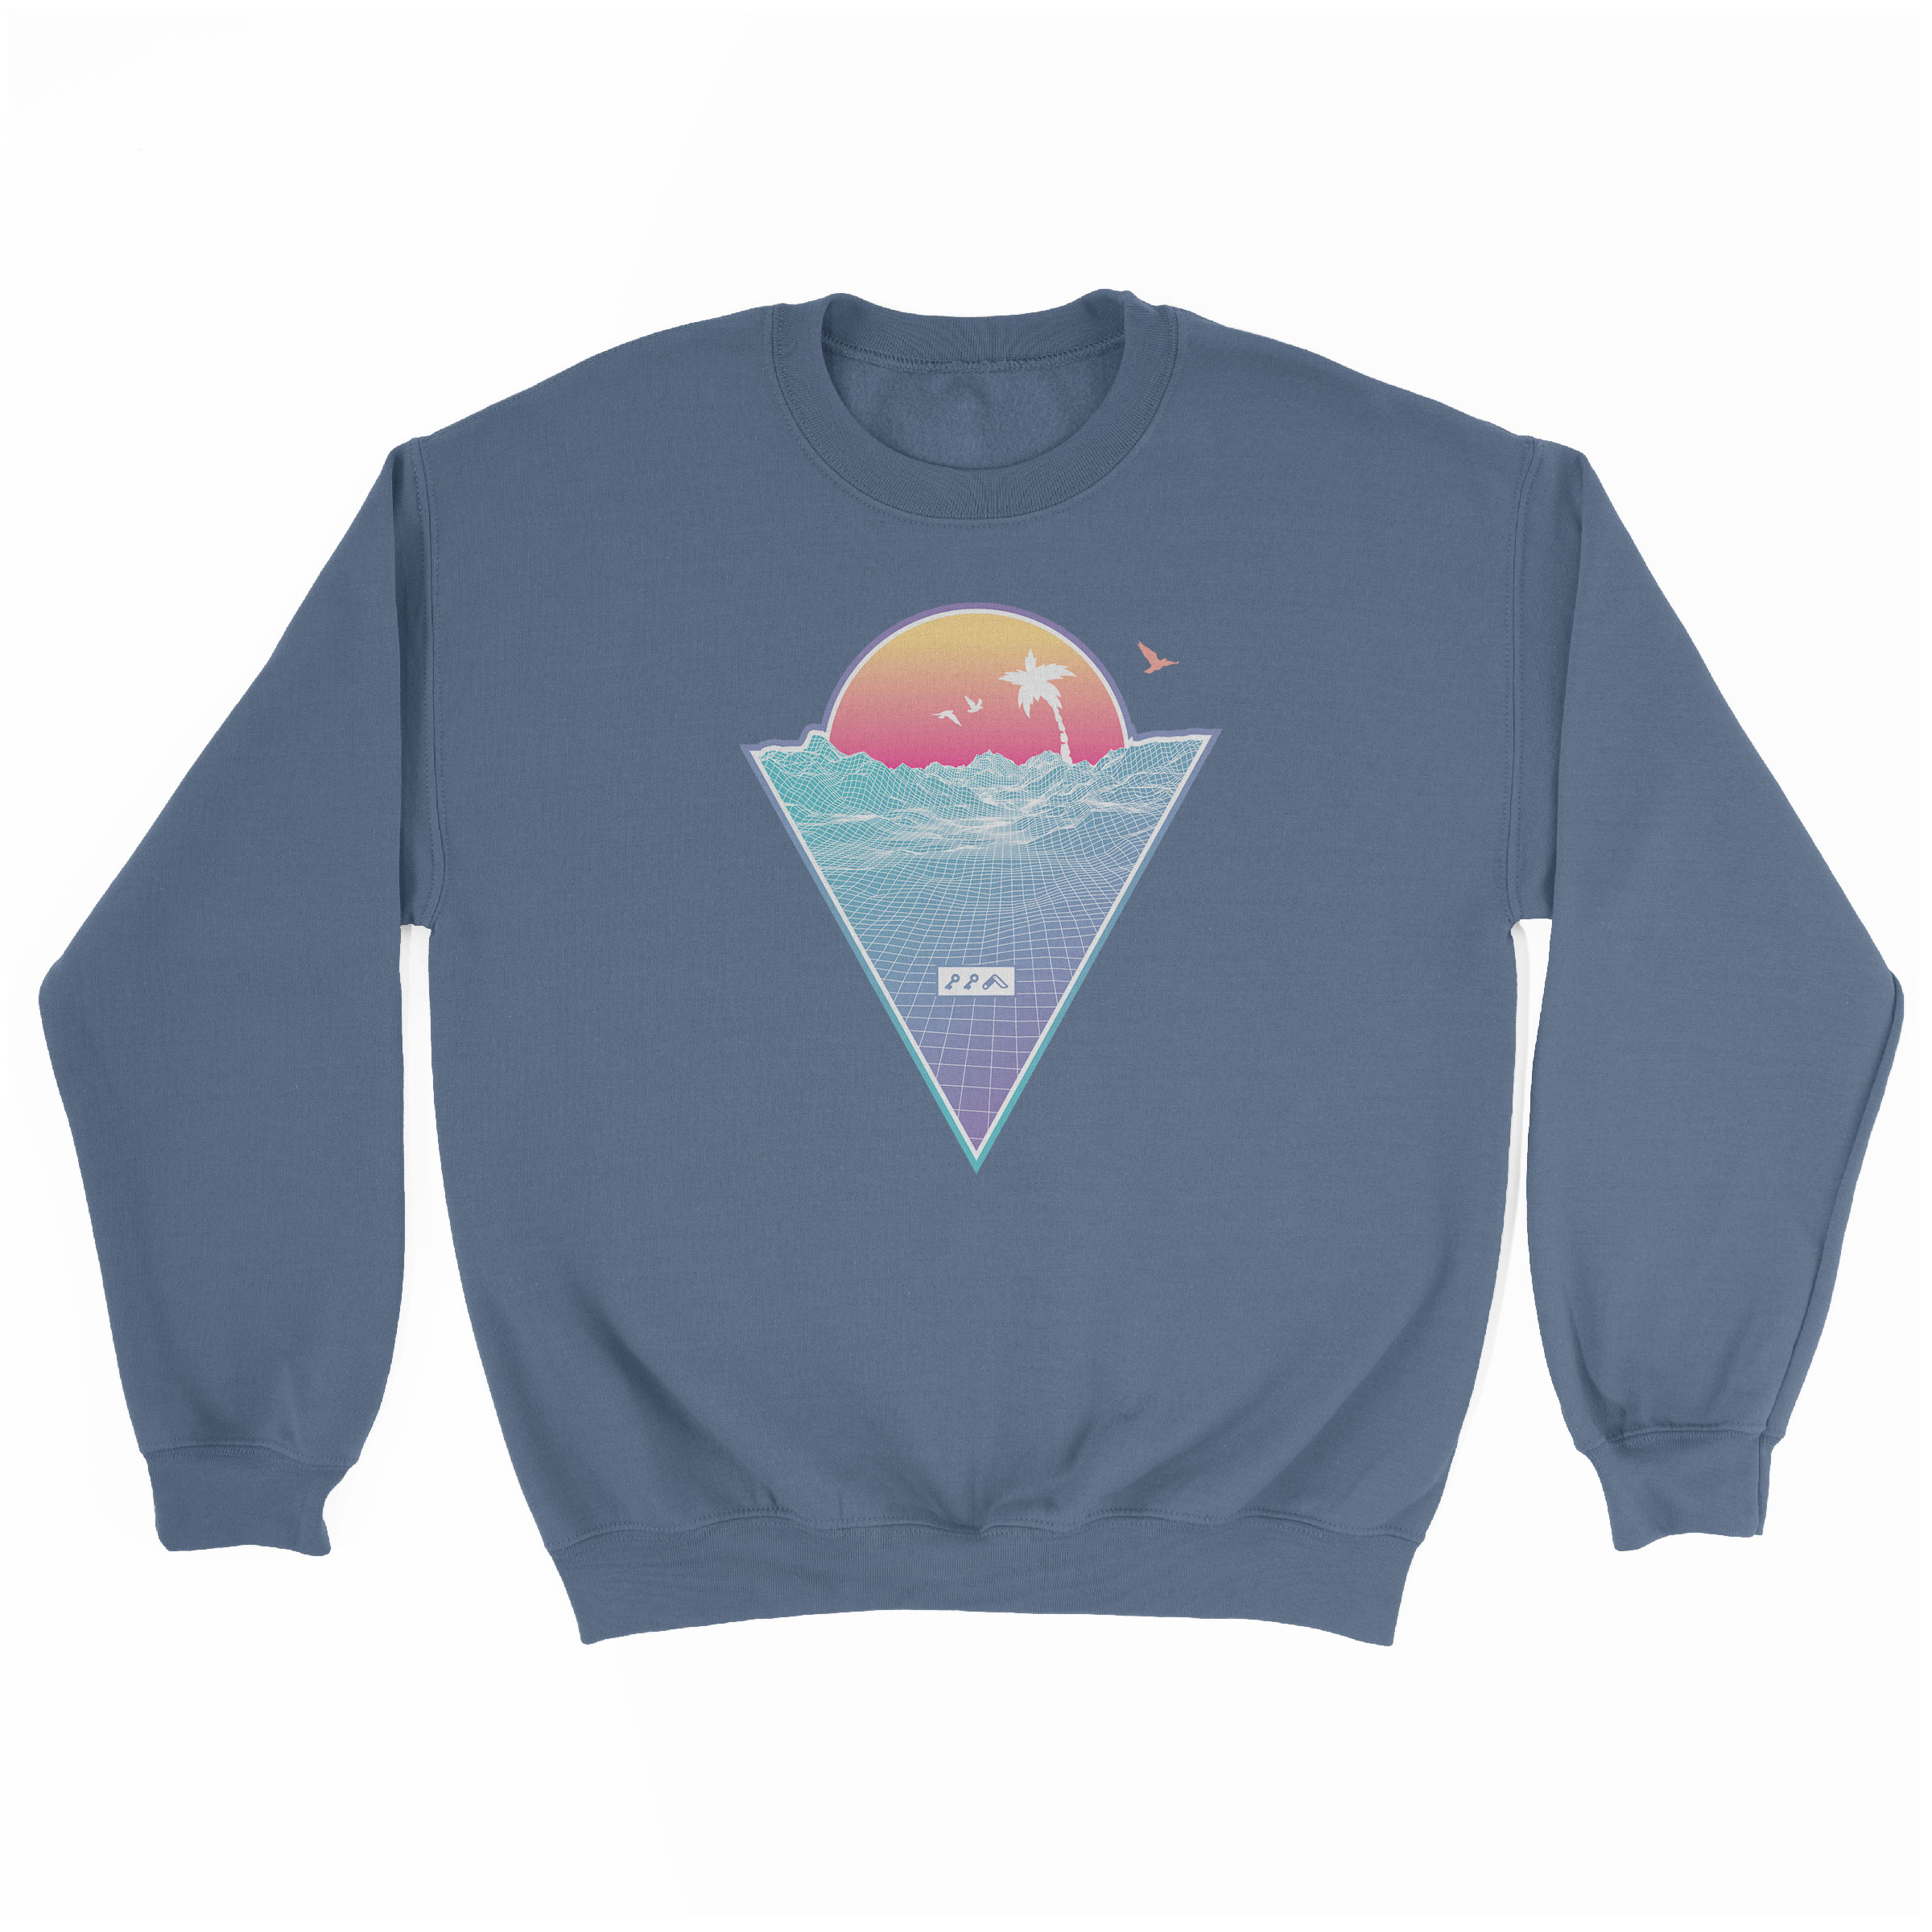 """OFF THE GRID"" cali vibes retro 80s design sweatshirt indigo at kikicutt.com"